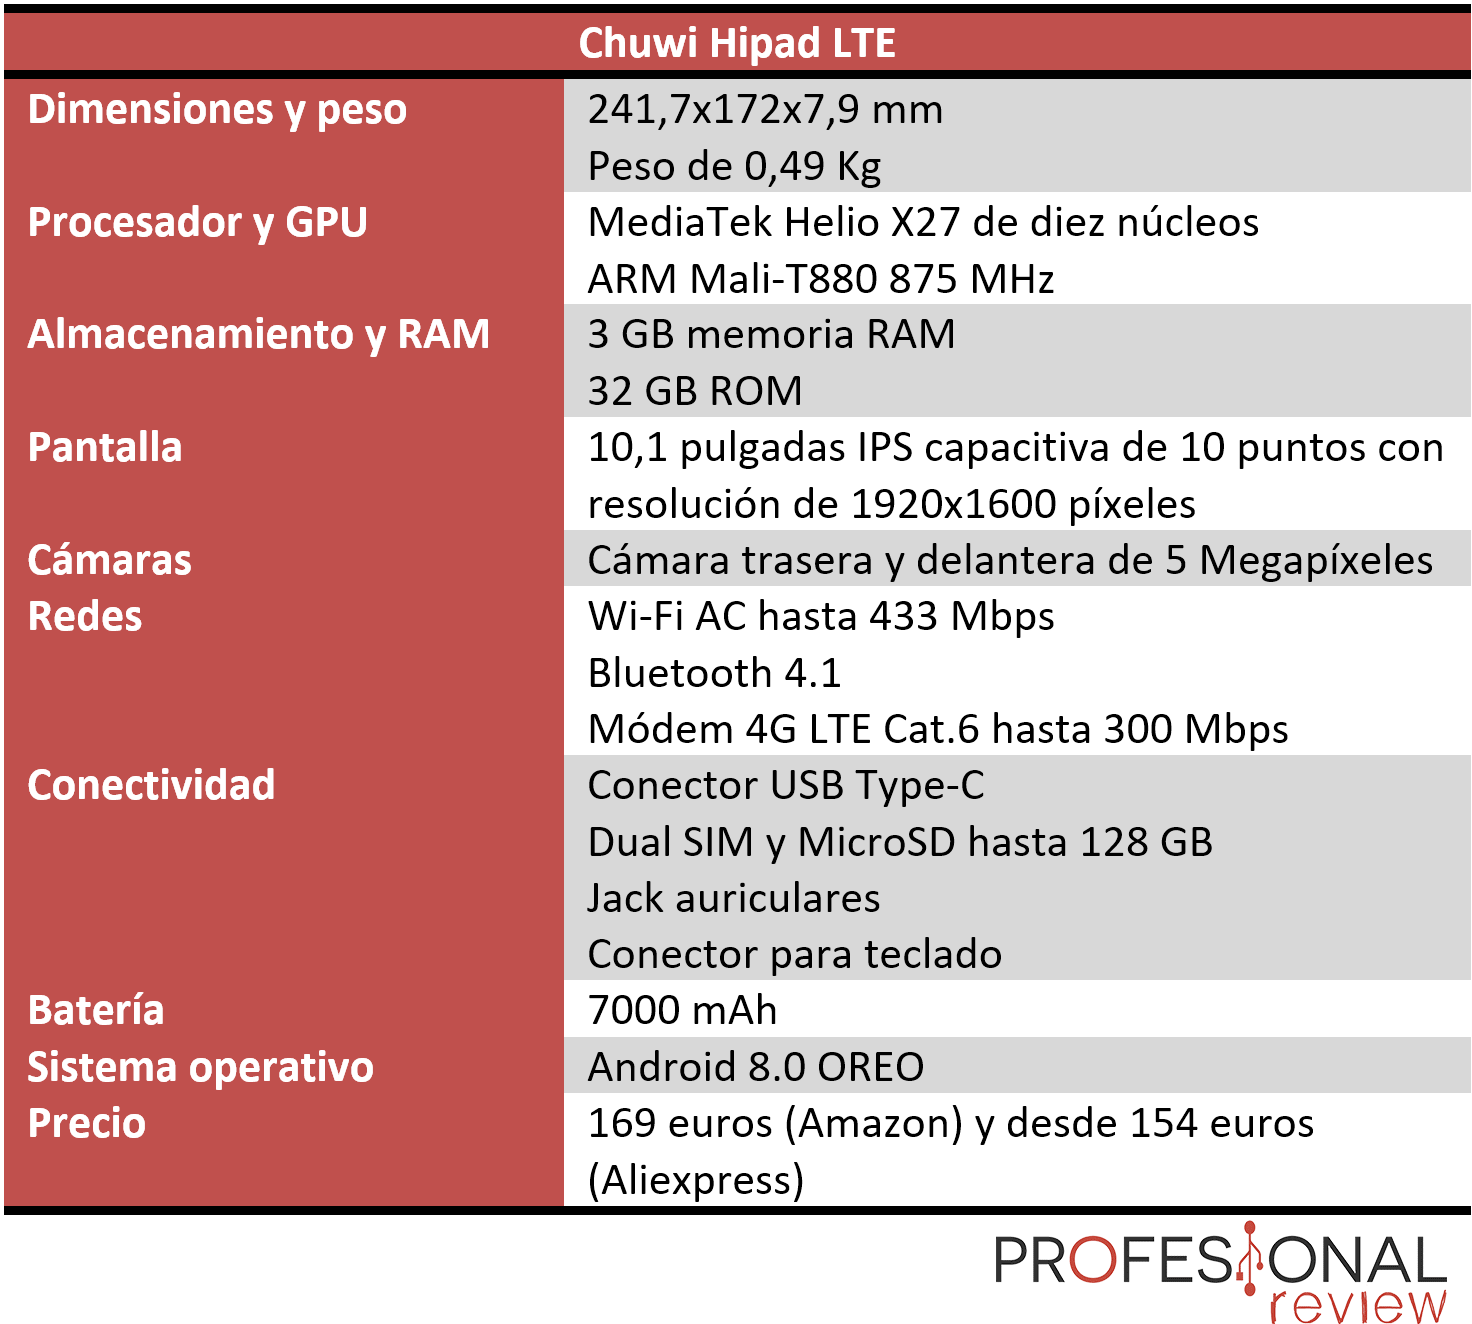 Chuwi Hipad LTE características